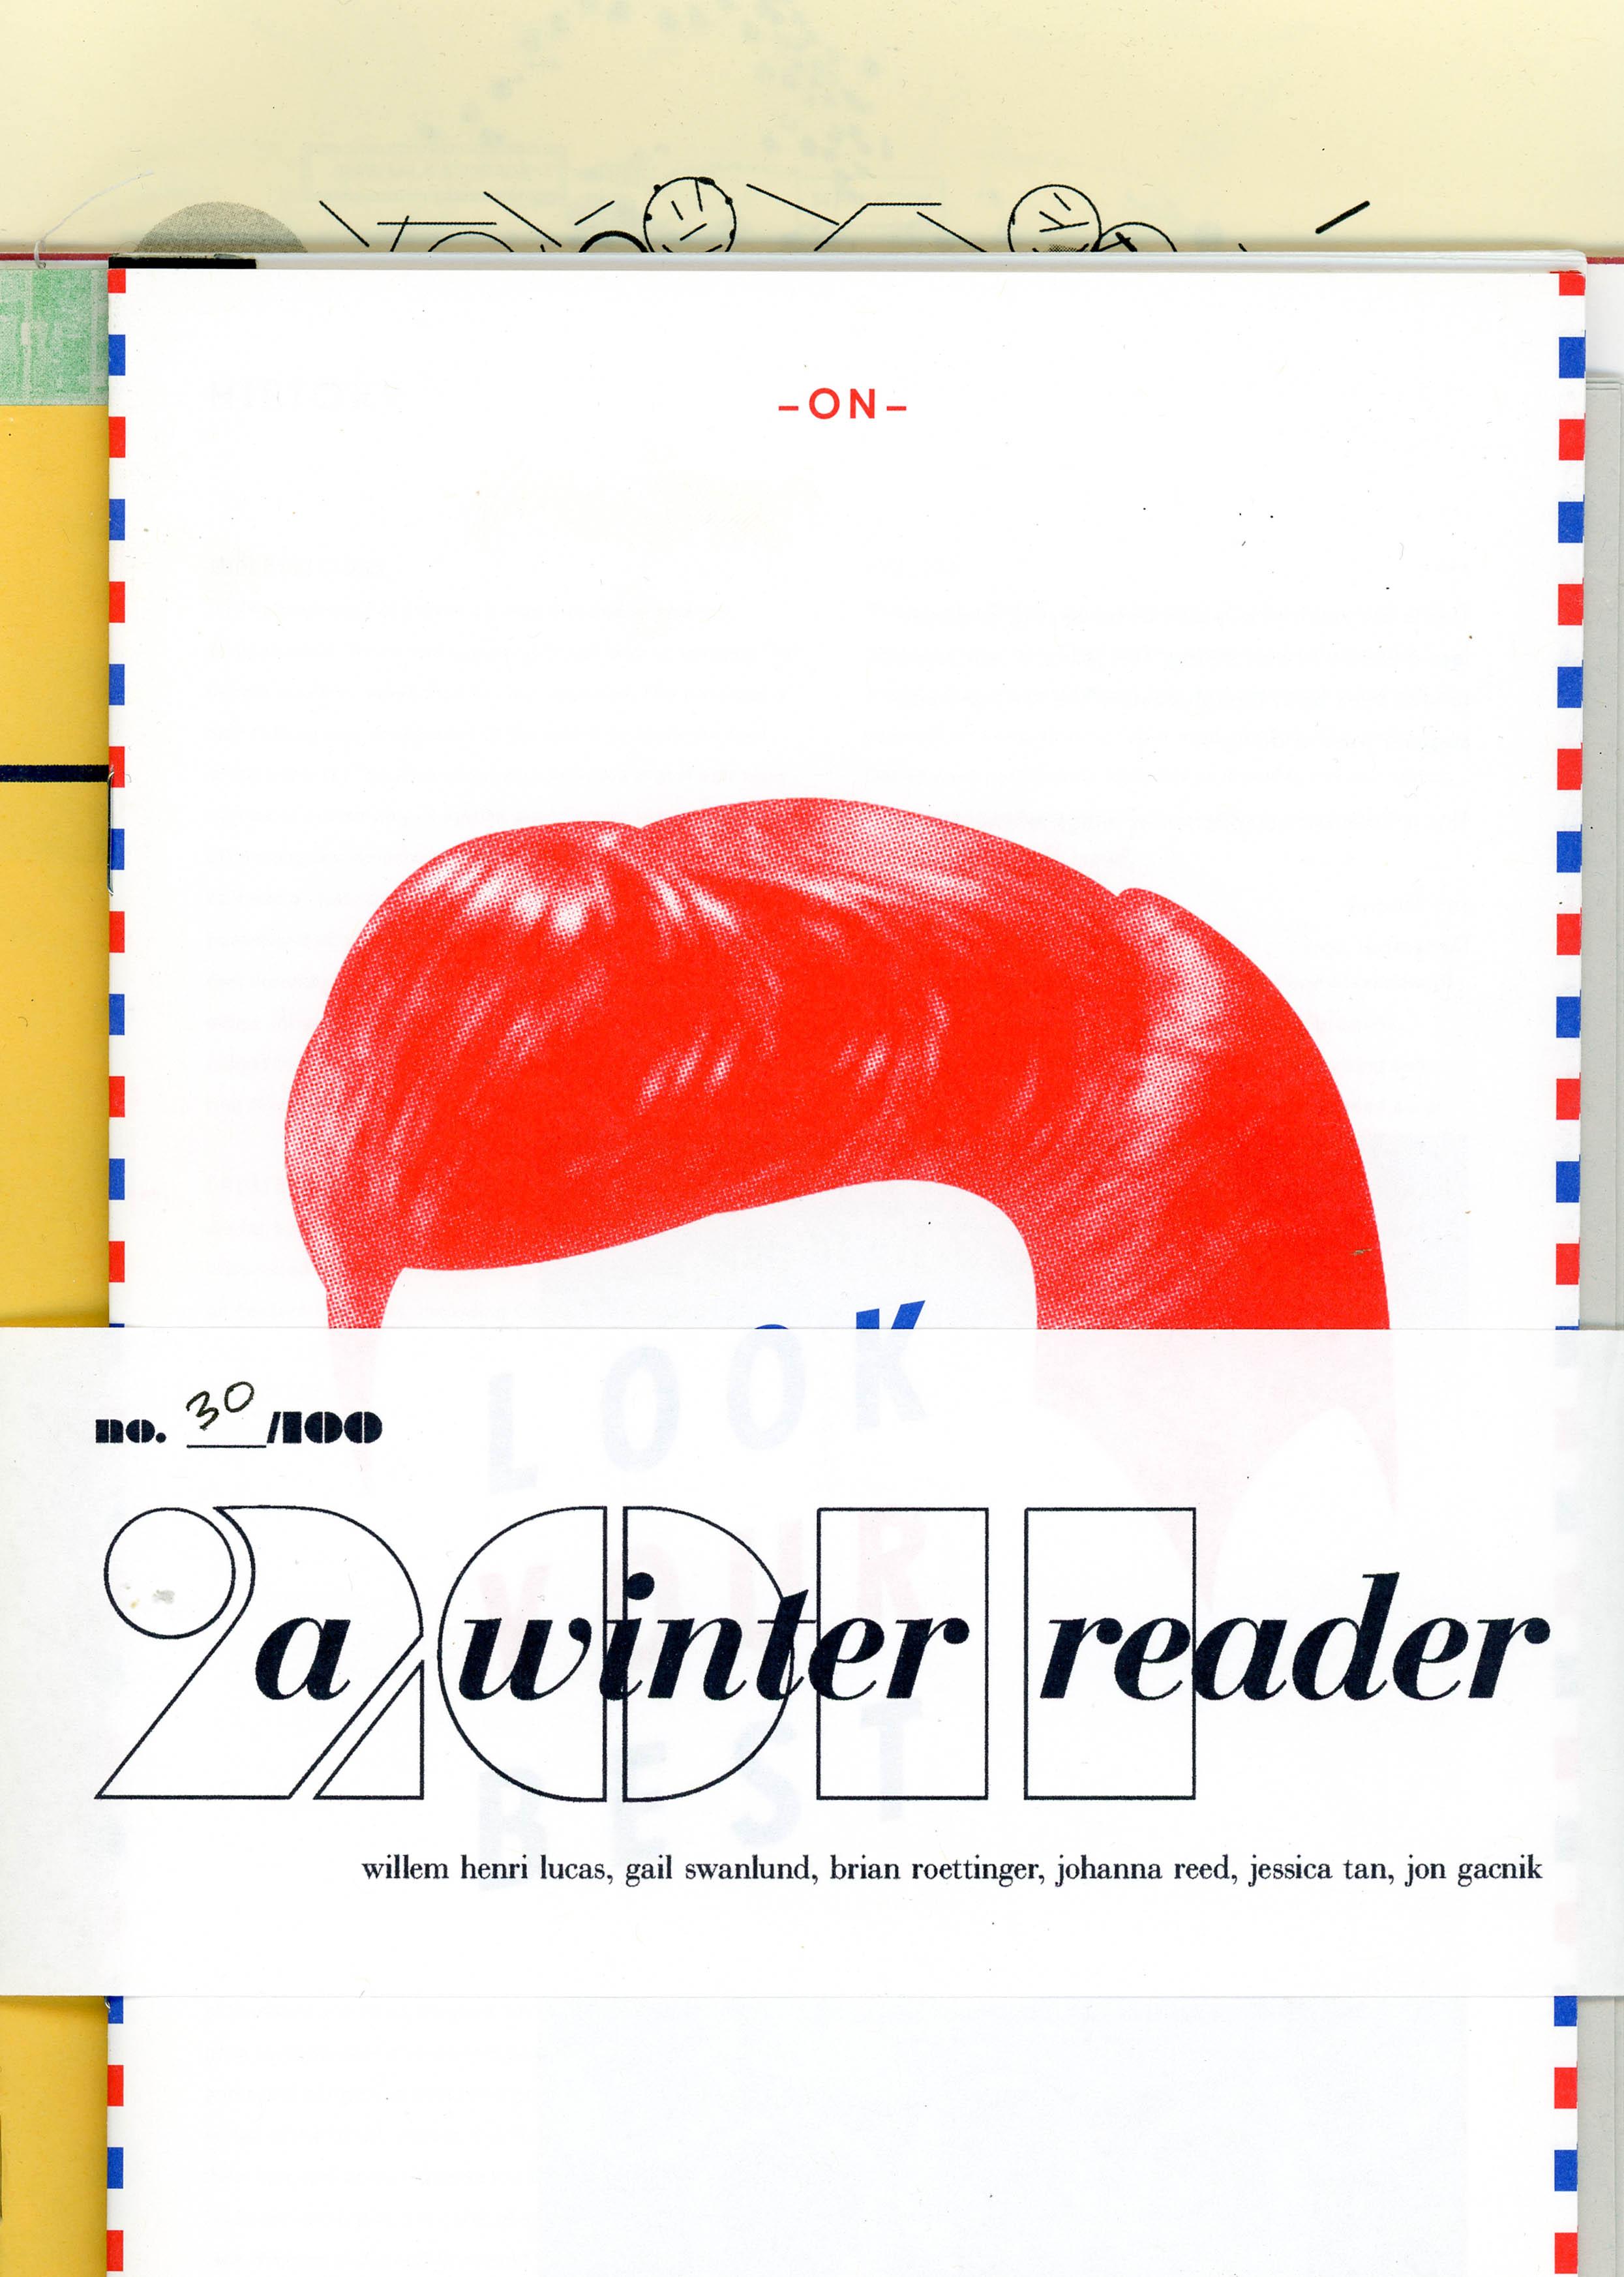 Winter 11, Issue 2